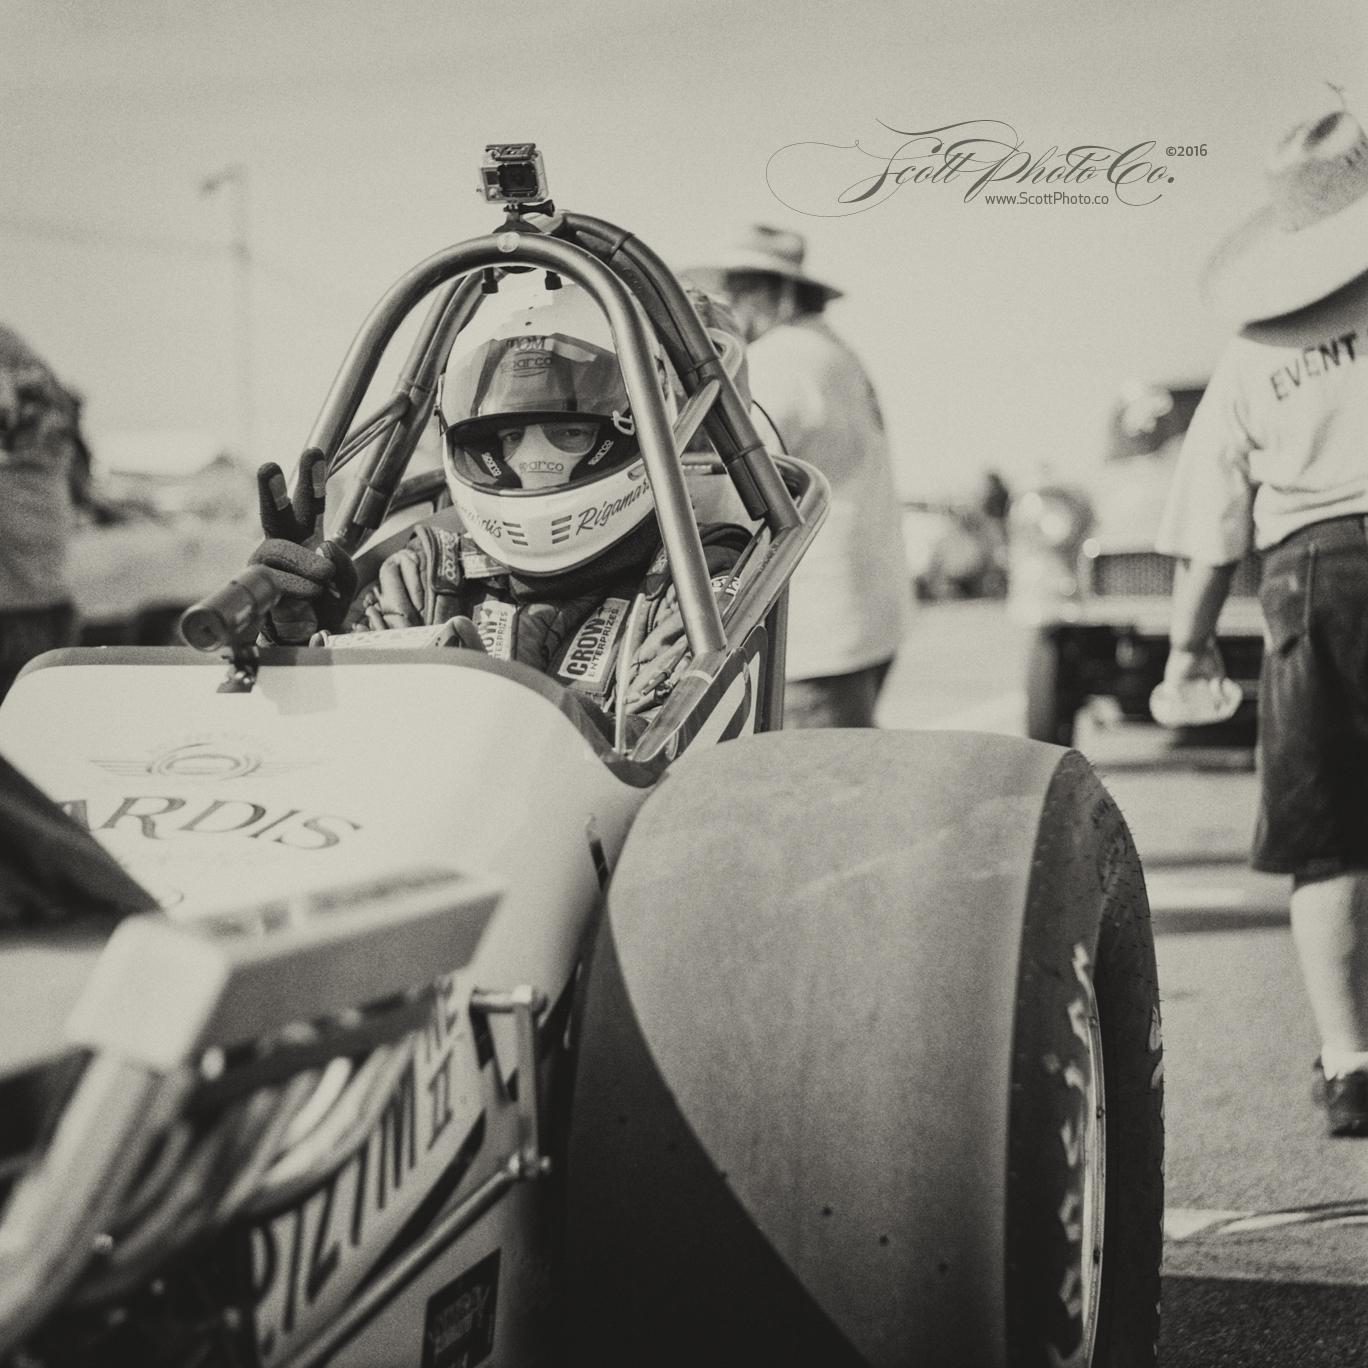 HRR_2014_ScottPhotoCo_Drivers_12_SPC.jpg